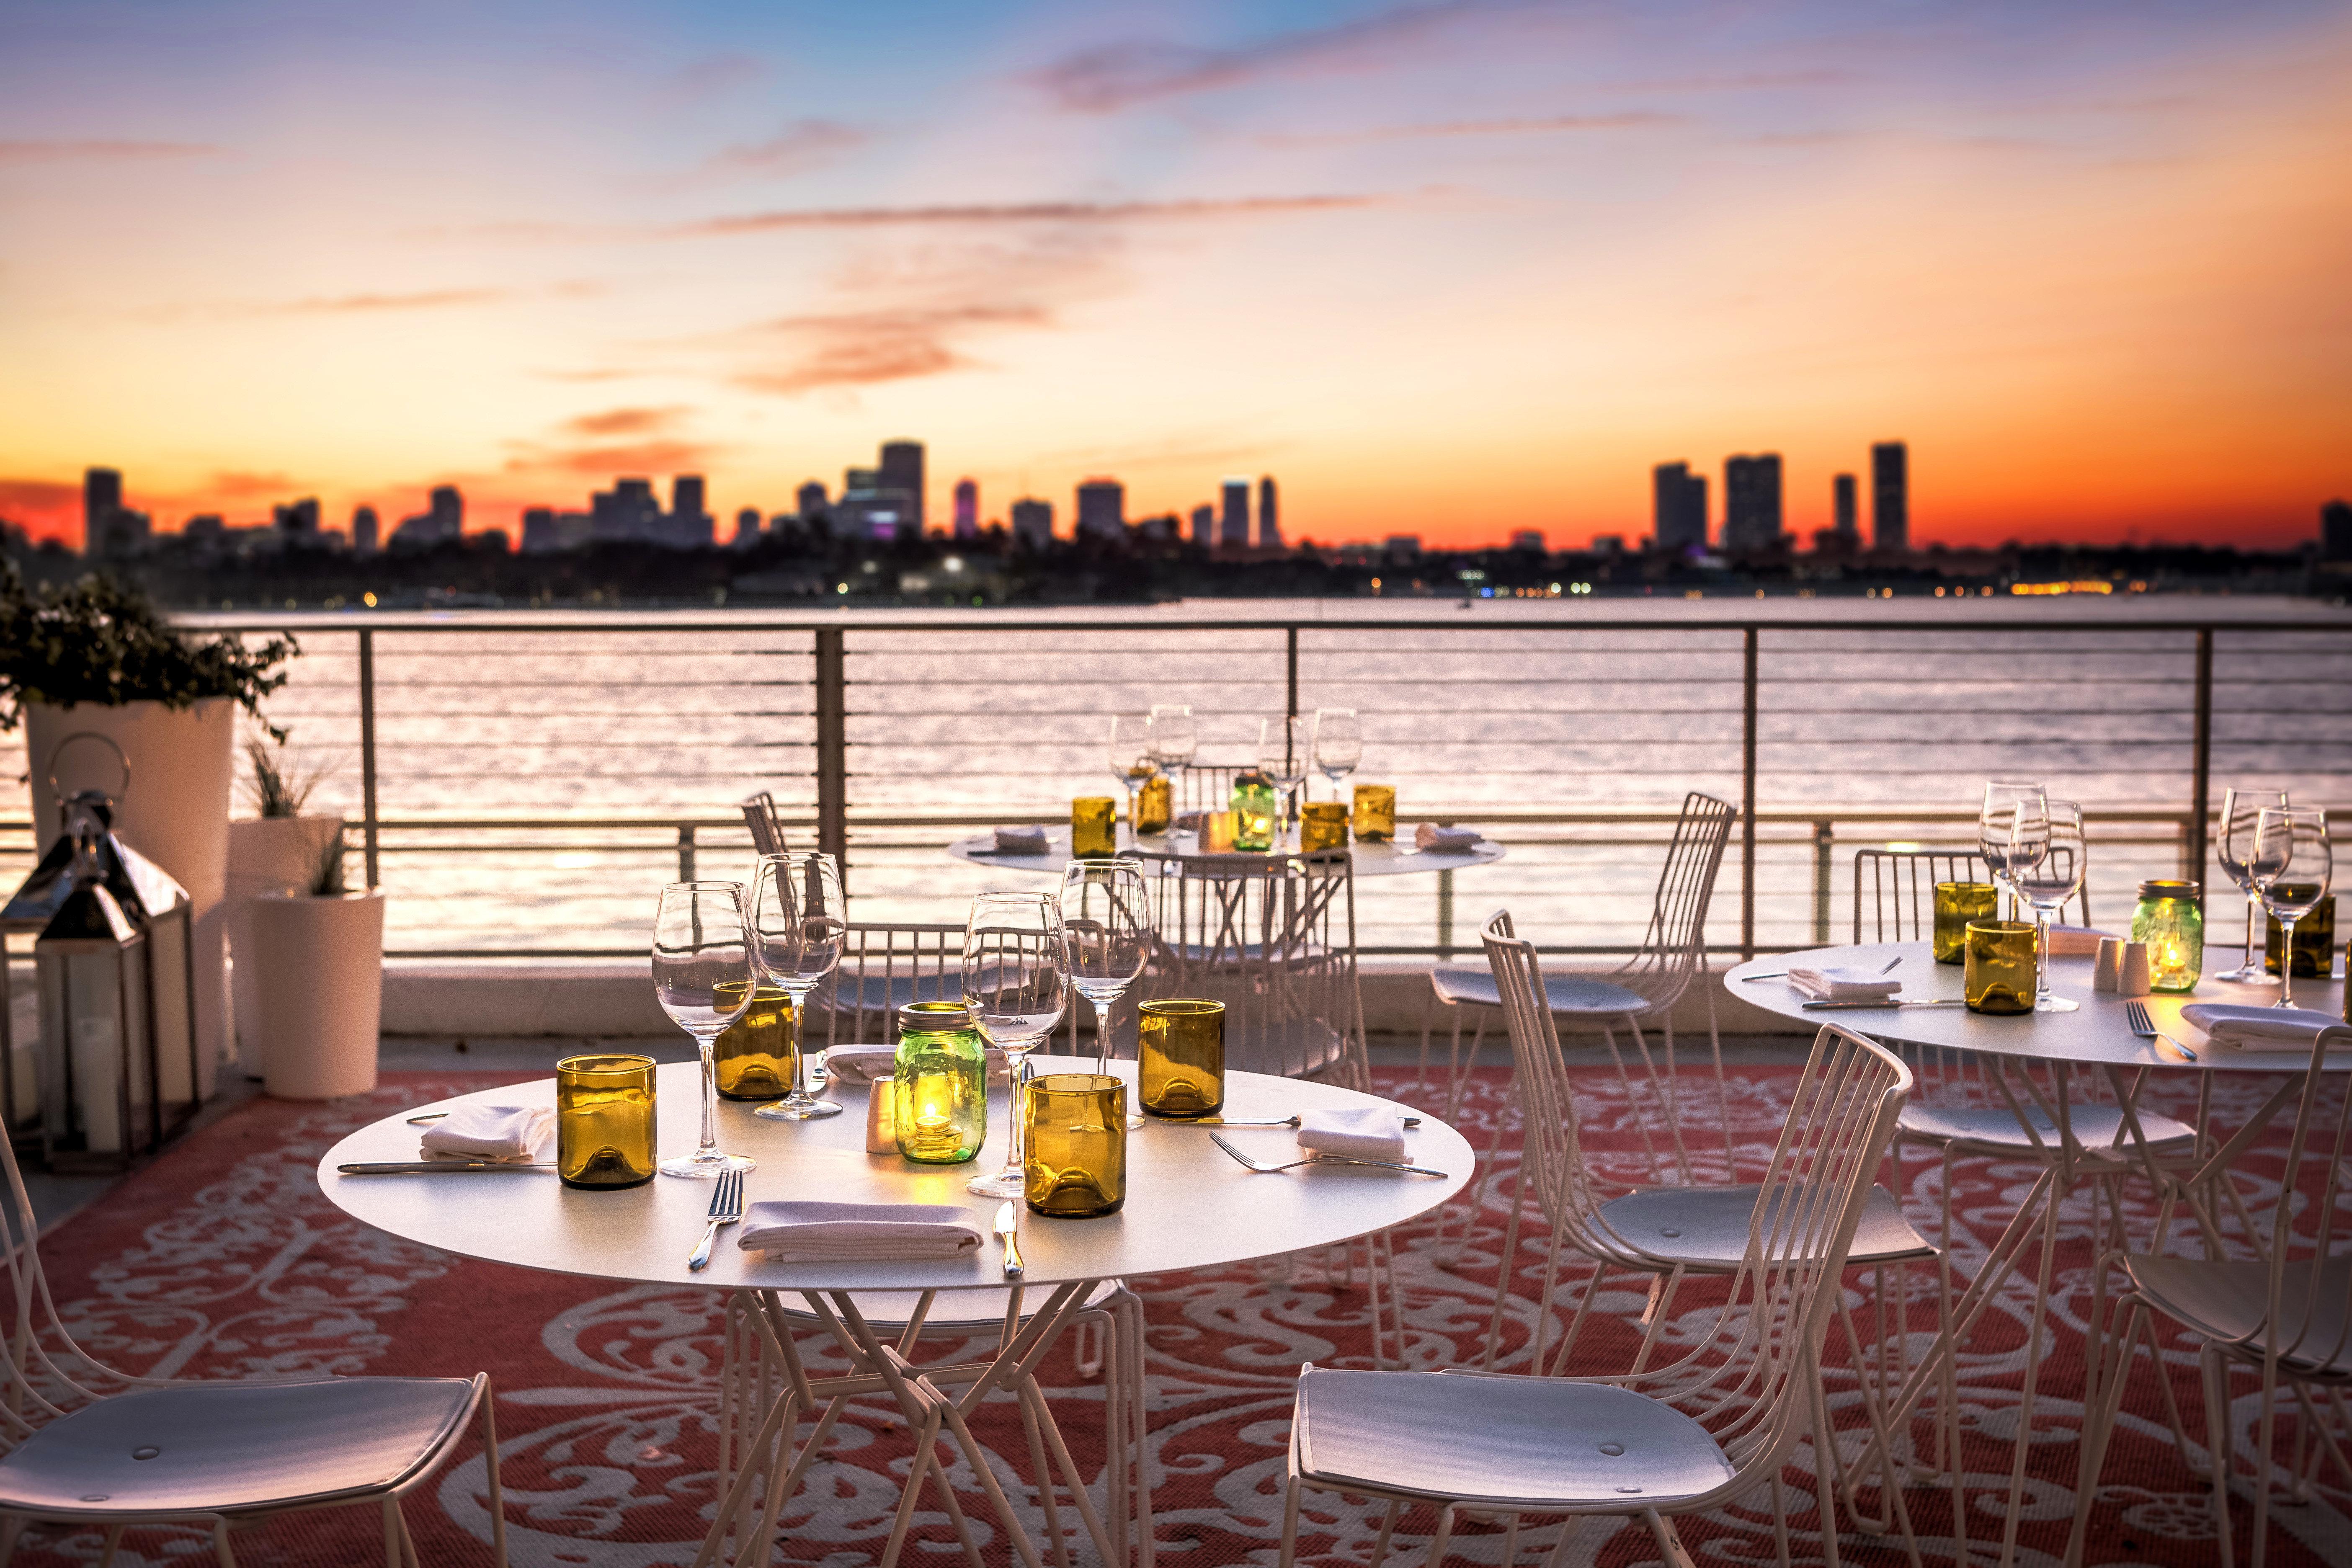 Dining Drink Eat Resort Sunset sky chair restaurant set